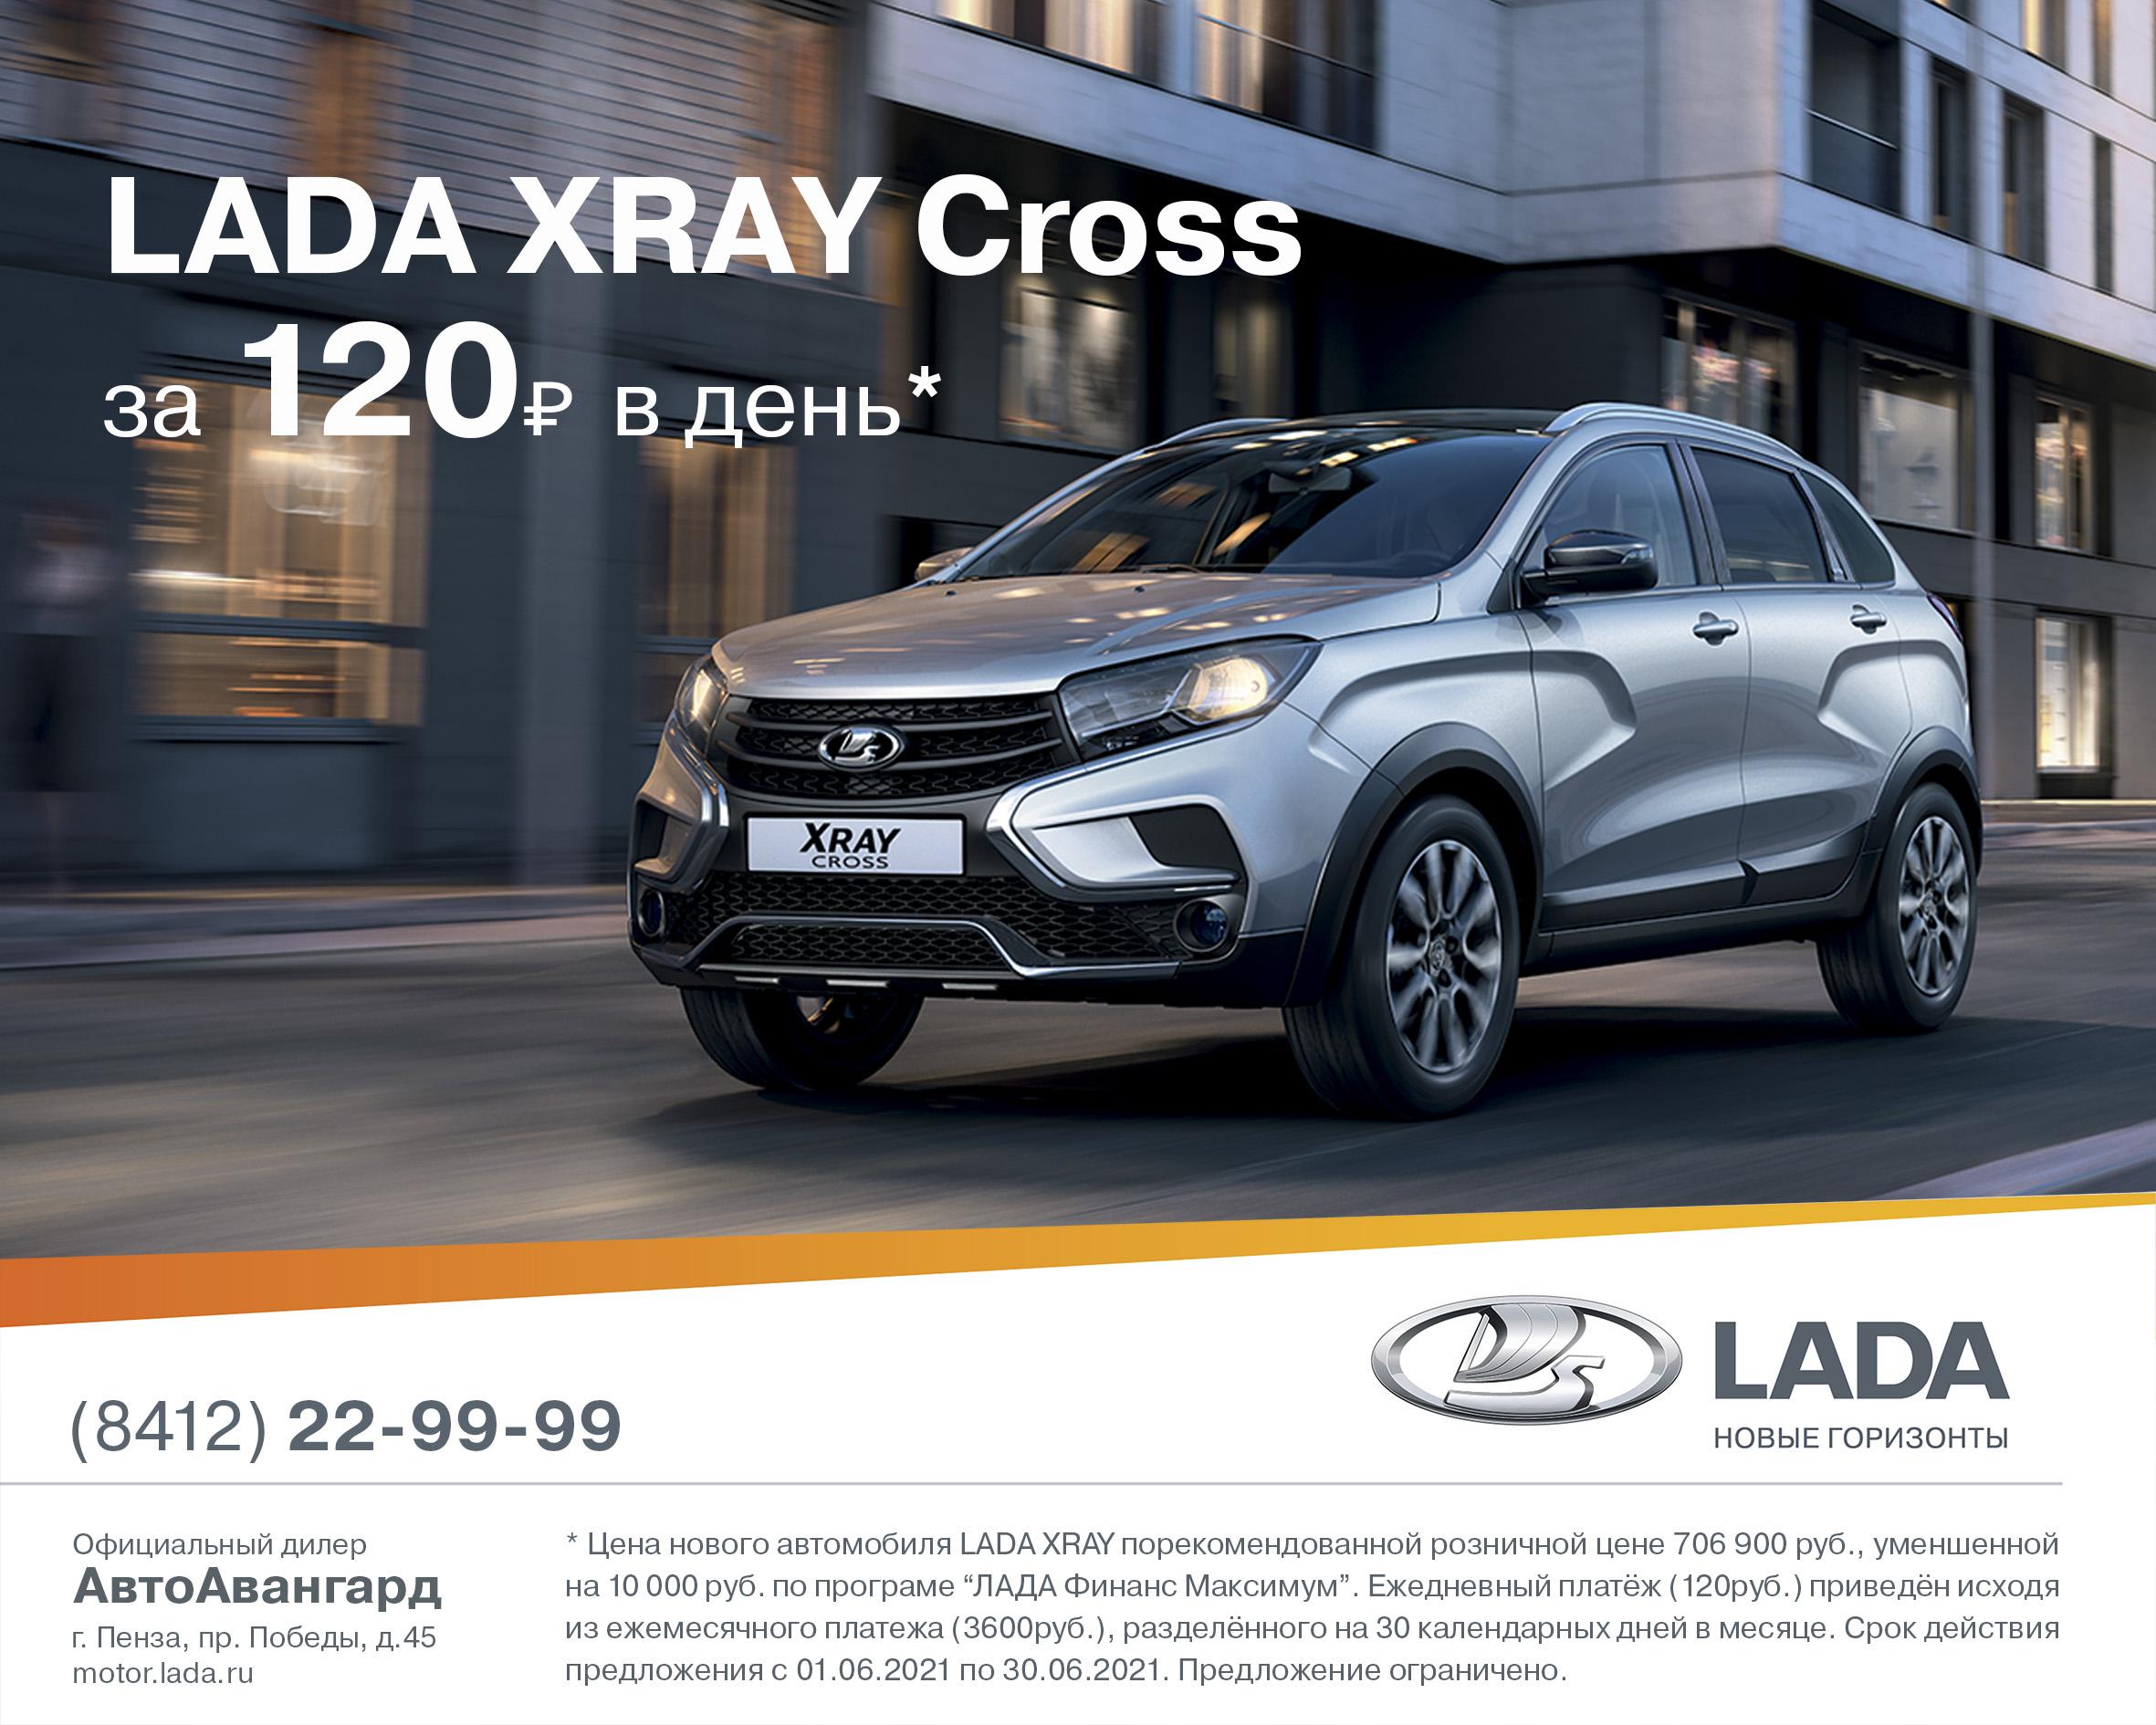 LADA XRAY за 120 руб. в день